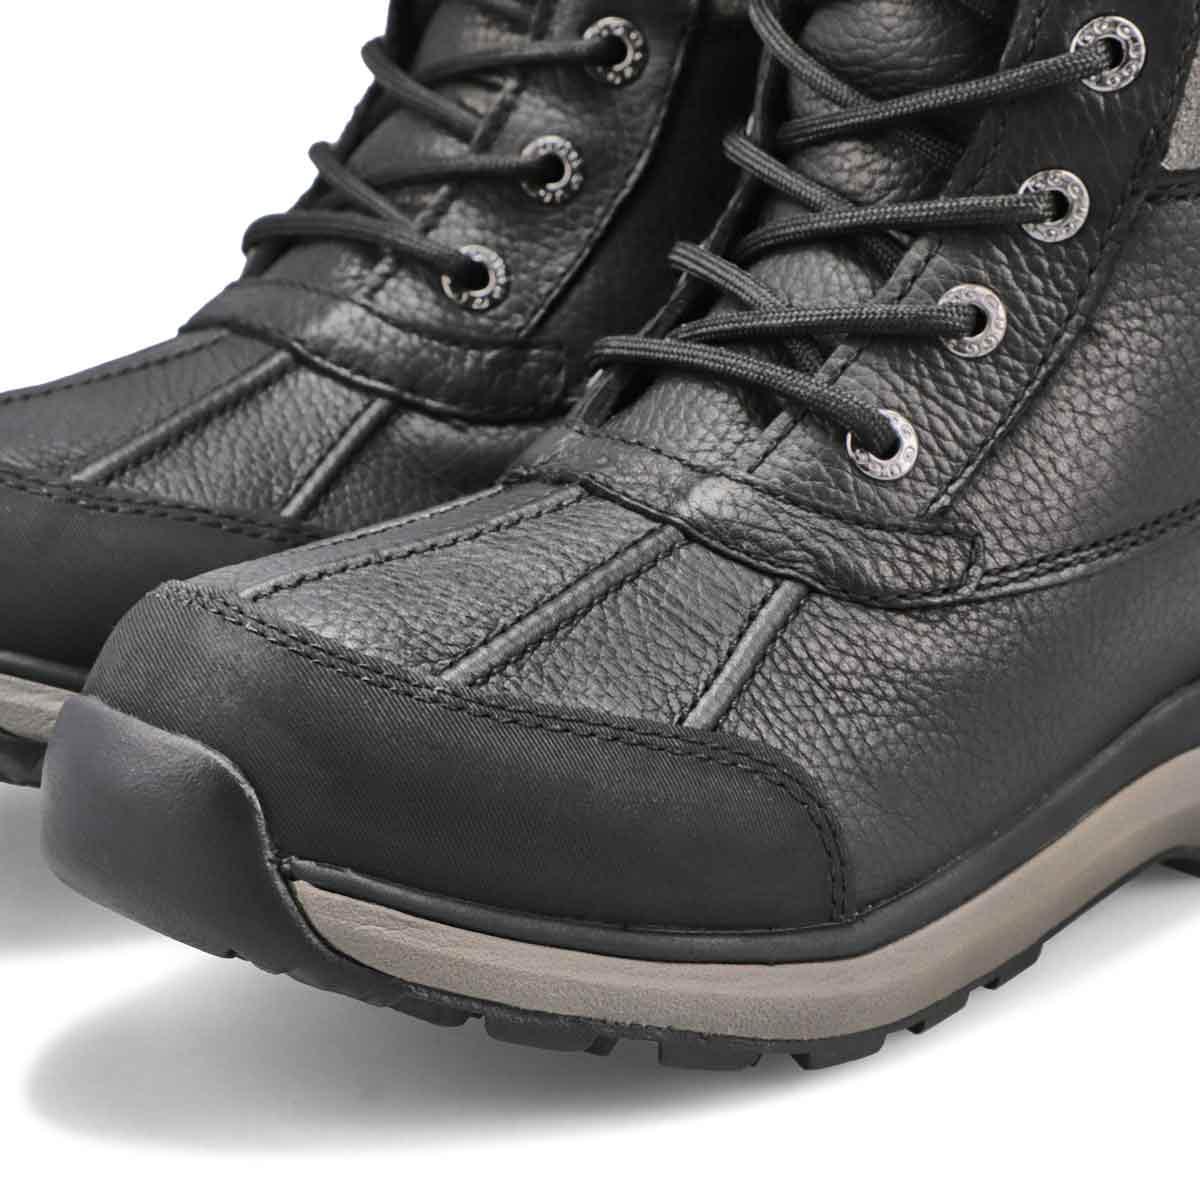 Bottes d'hiver ADIRONDACK III noires femmes